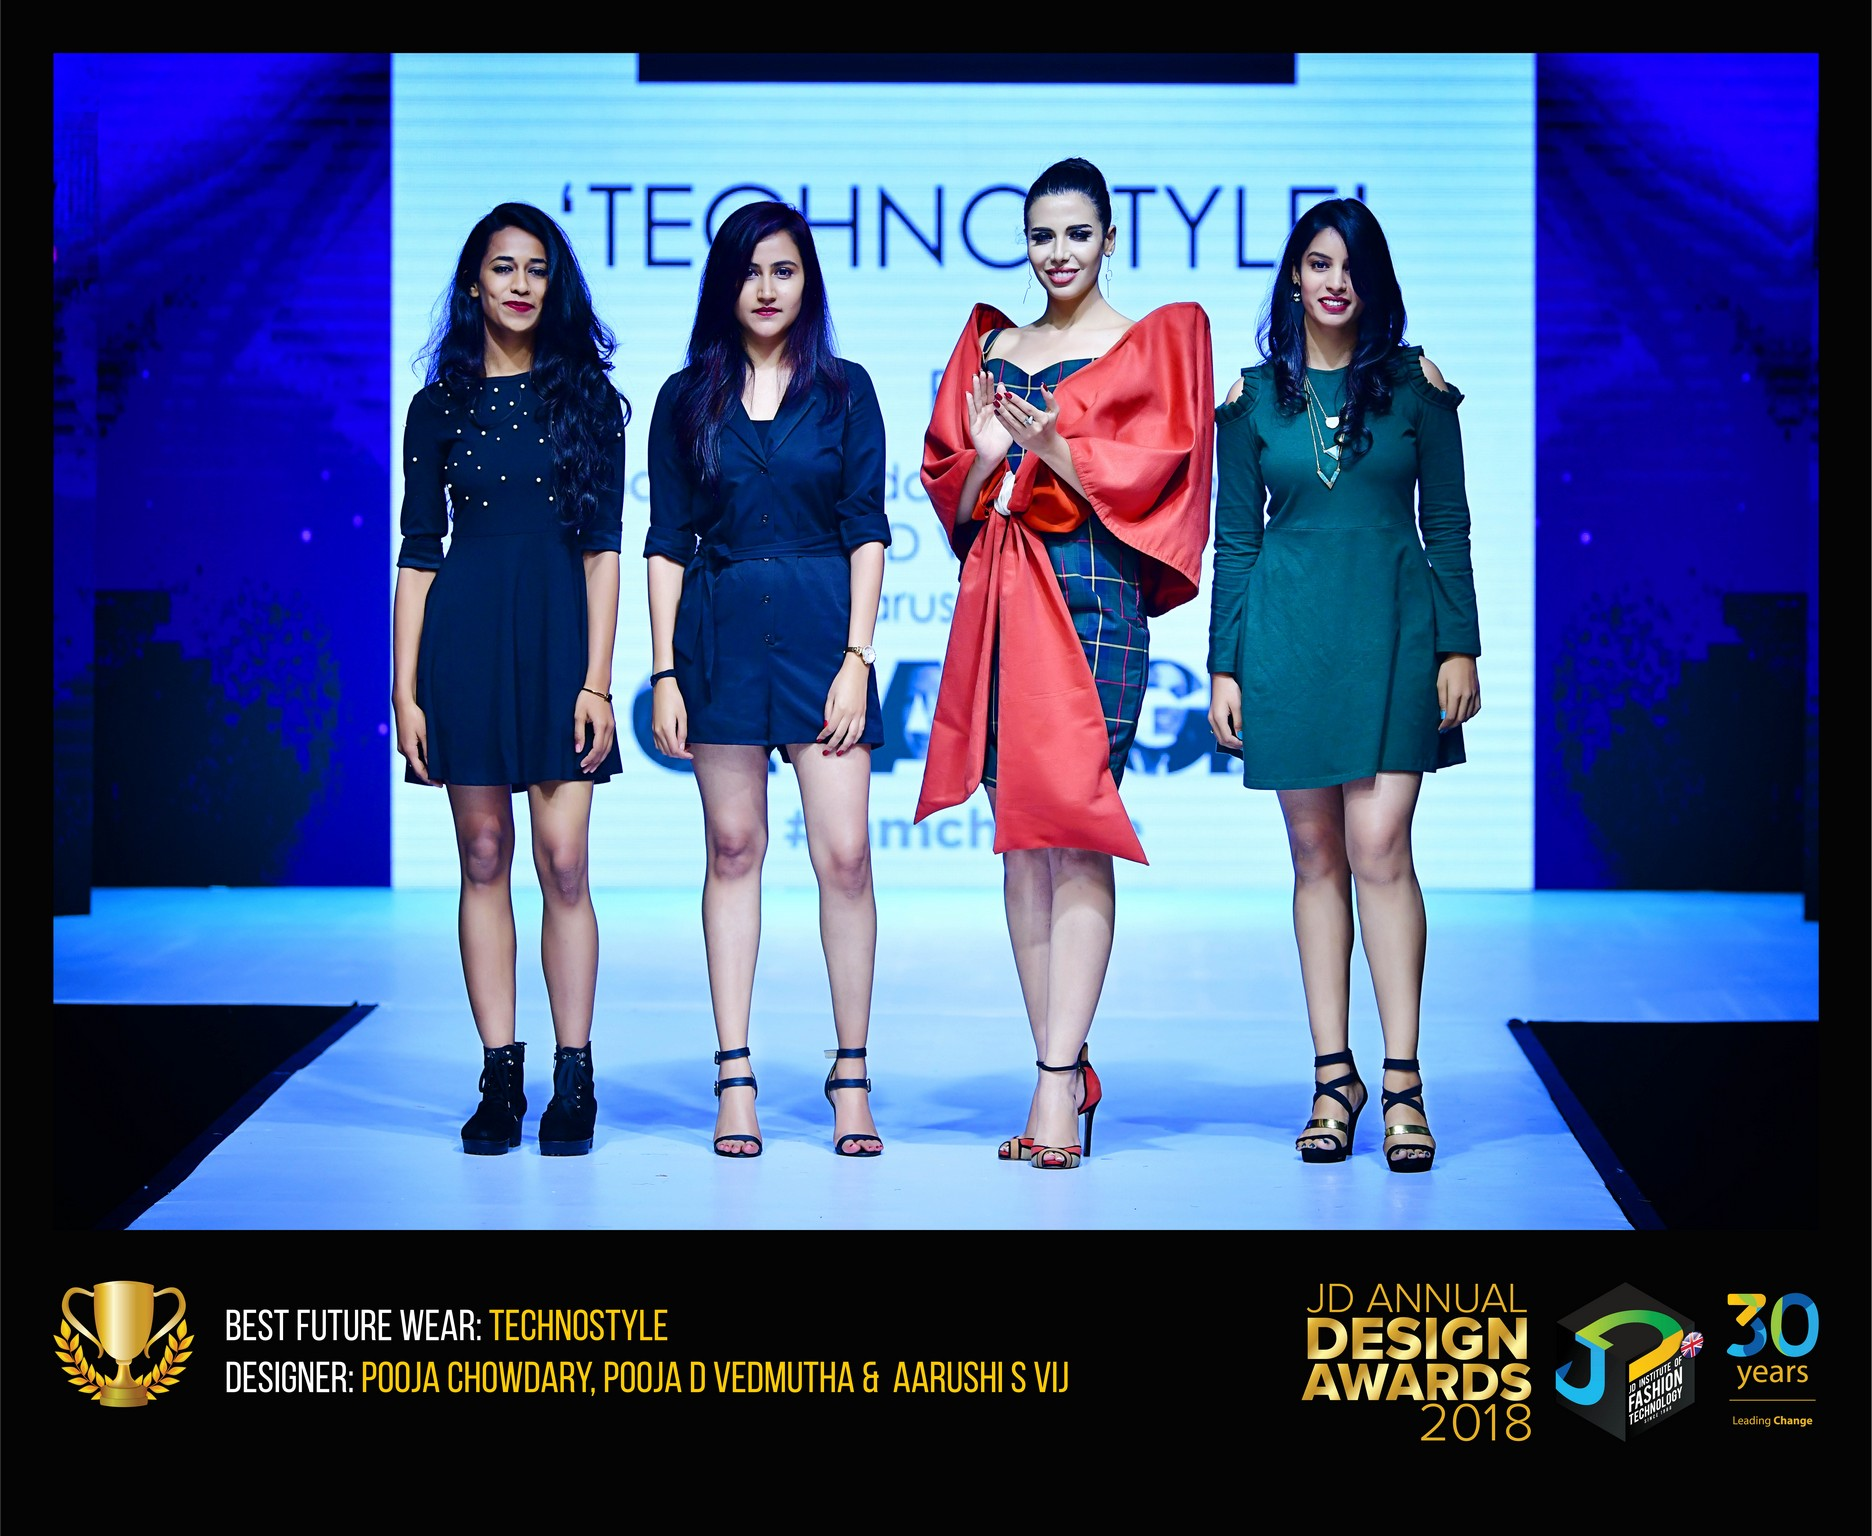 Techno style – Change – JD Annual Design Awards 2018 | Designer: M. Pooja, Pooja.D | Photography : Jerin Nath (@jerin_nath) techno style - Technostyle7 - Techno style – Change – JD Annual Design Awards 2018